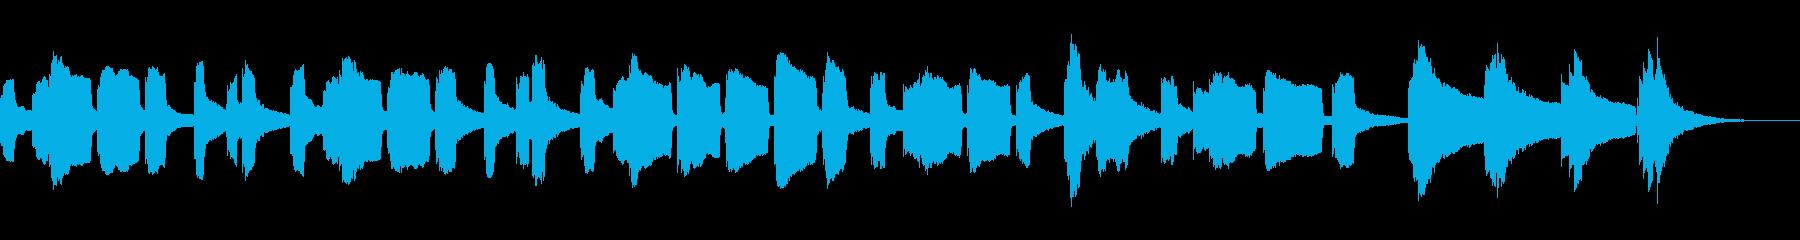 KANT可愛いハッピーバースデー2の再生済みの波形